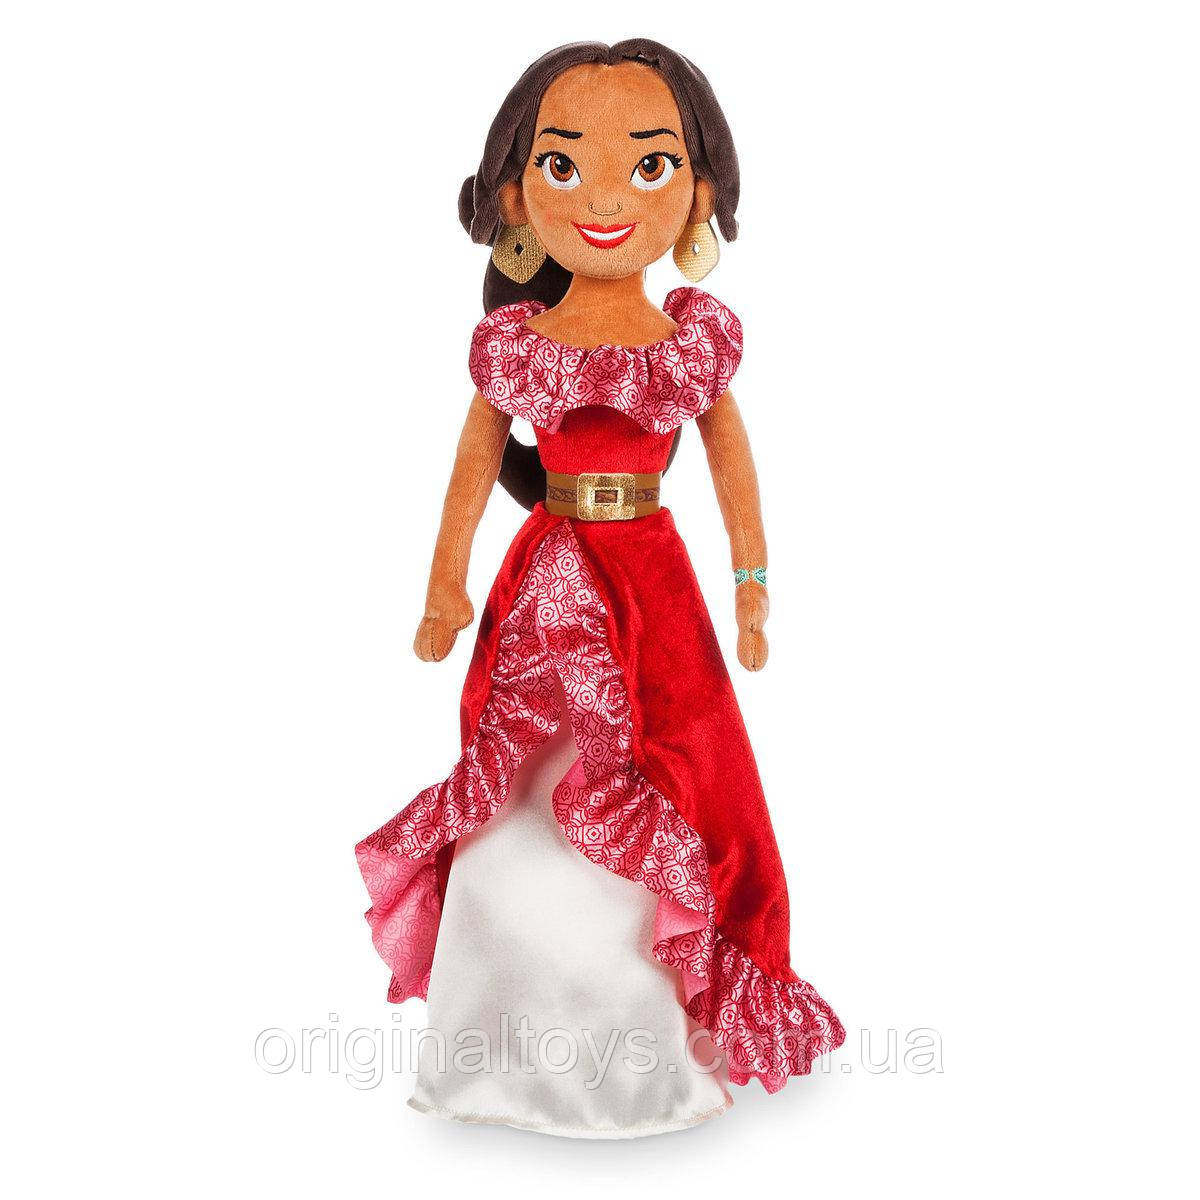 Мягкая игрушка кукла Елена из Авалора Disney